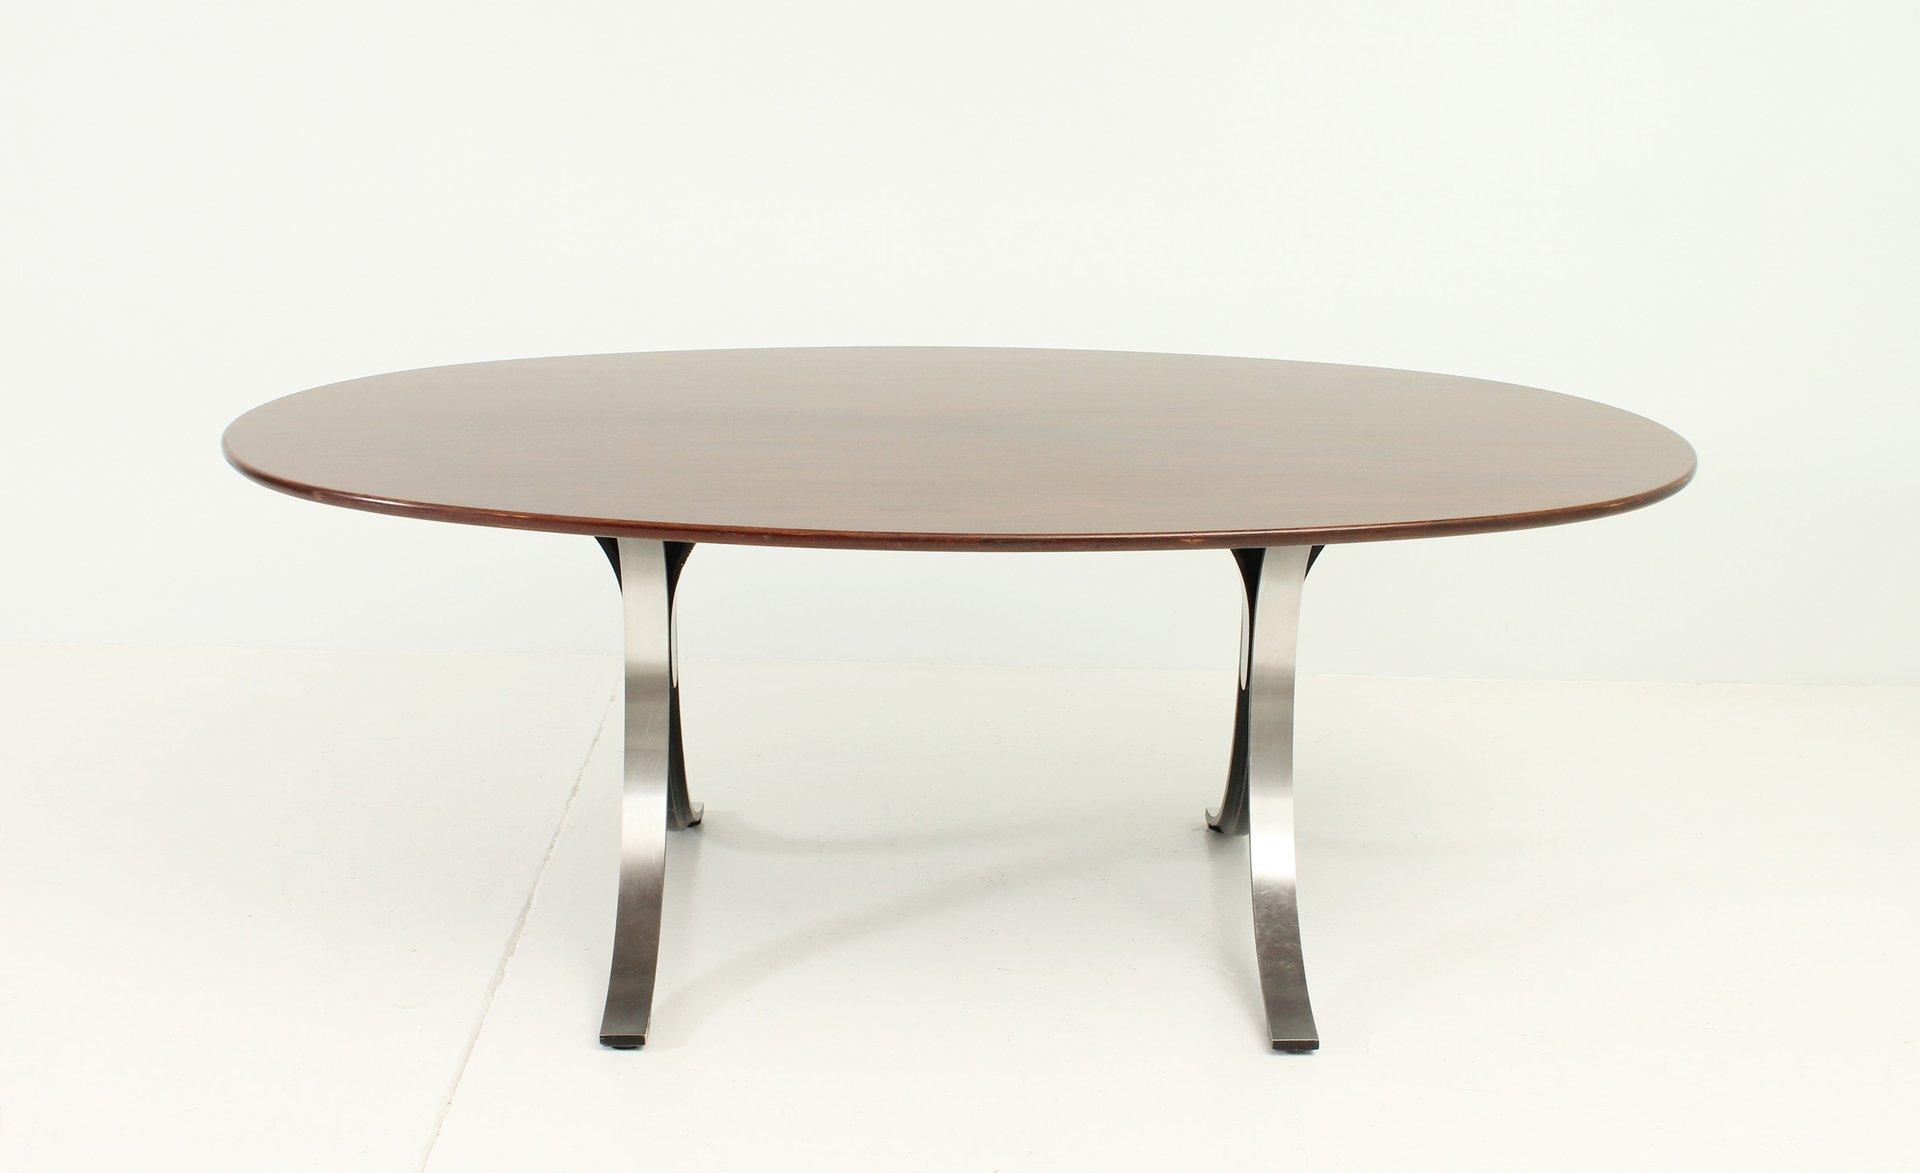 ovaler tisch t102a von osvaldo borsani eugenio gerli f r. Black Bedroom Furniture Sets. Home Design Ideas